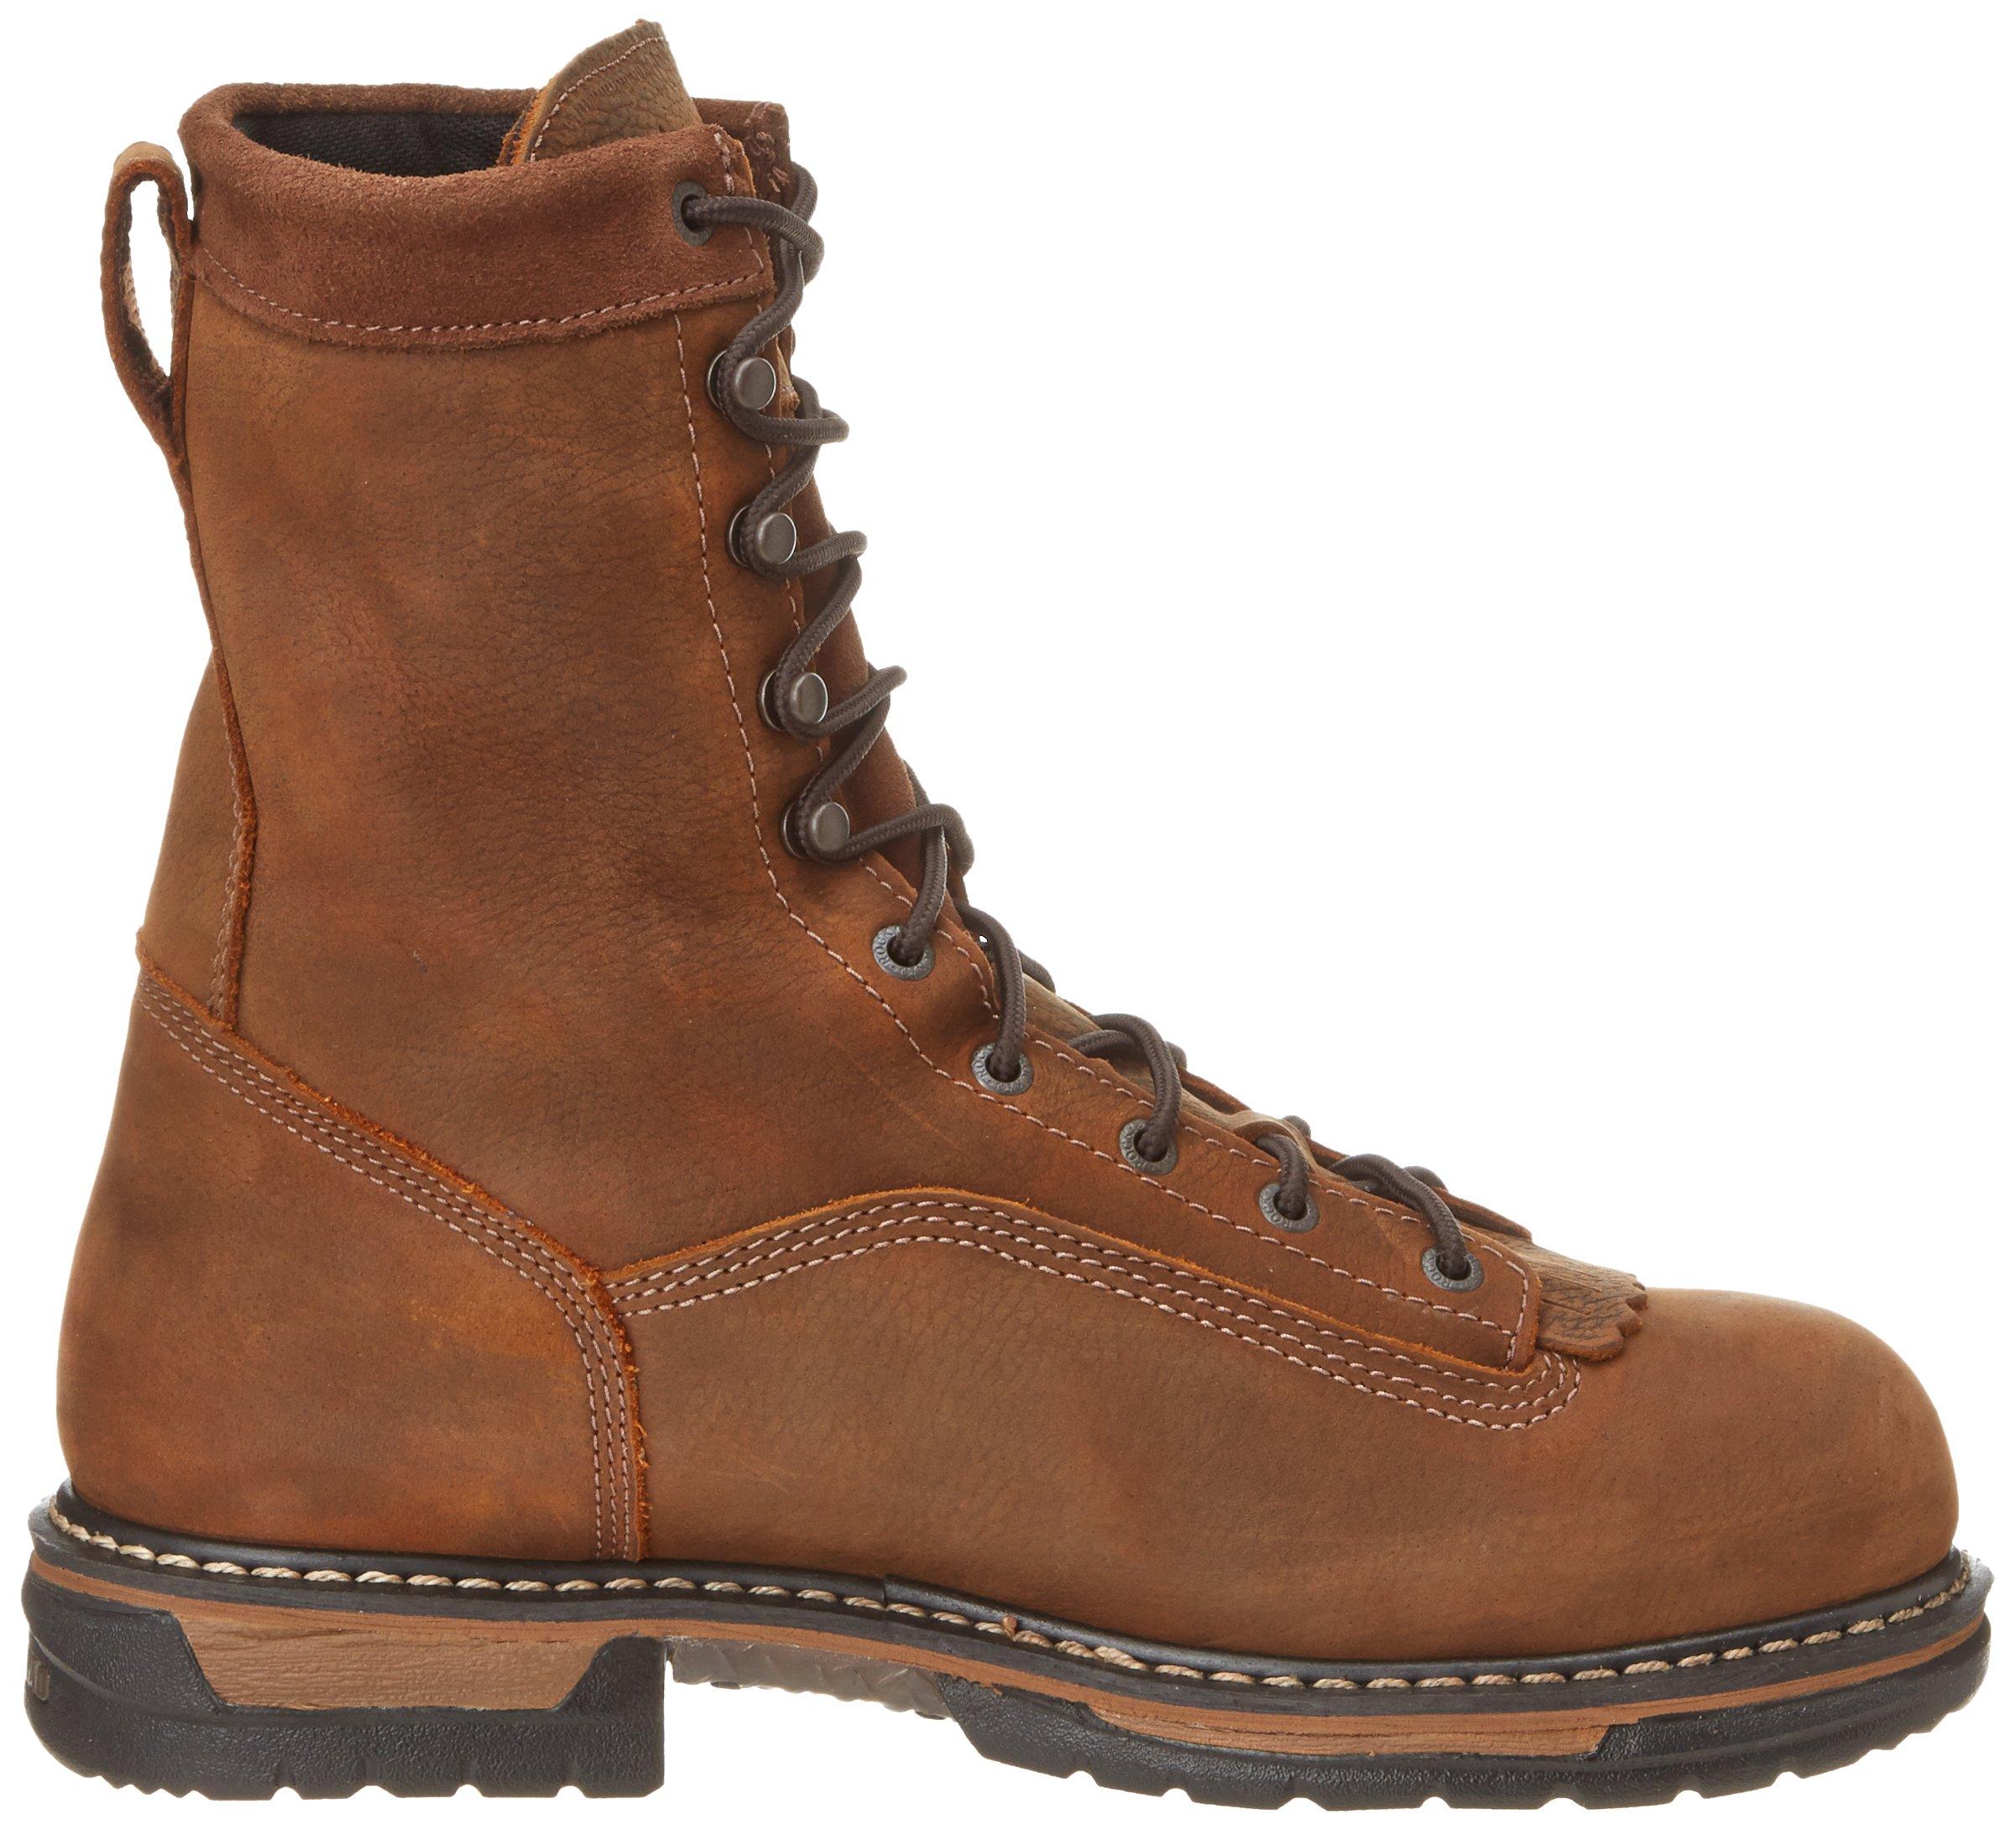 Rocky Men's Iron Clad Eight Inch LTT Steel Toe Work Boot,Brown,13 M US by Rocky (Image #6)